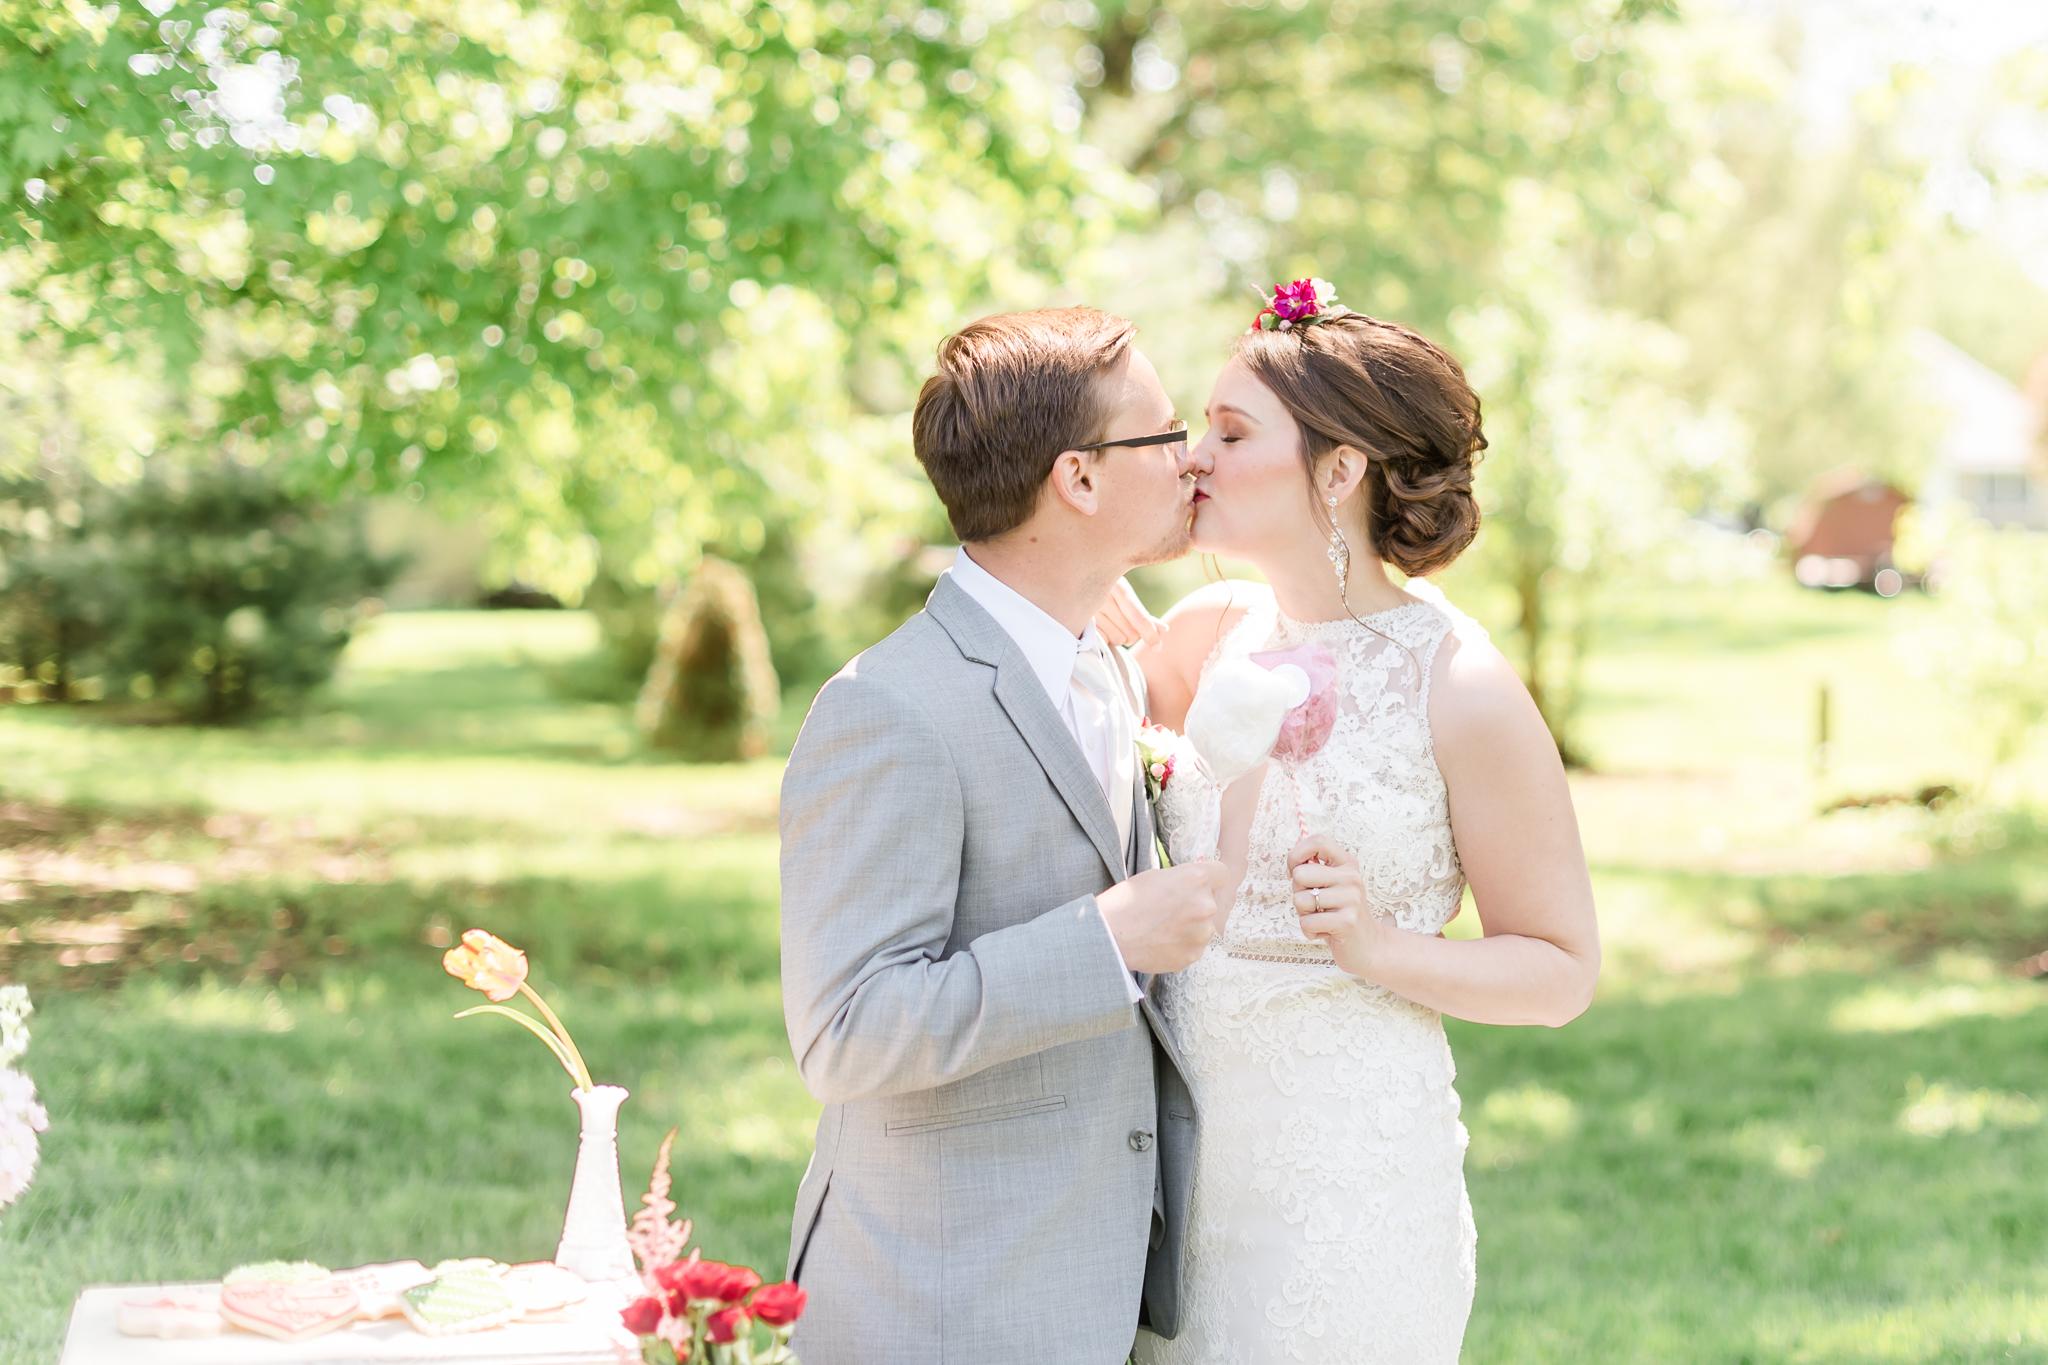 Mustard Seed Gardens Wedding Indianapolis Noblesvile Fishers Wedding Photographer-61.jpg